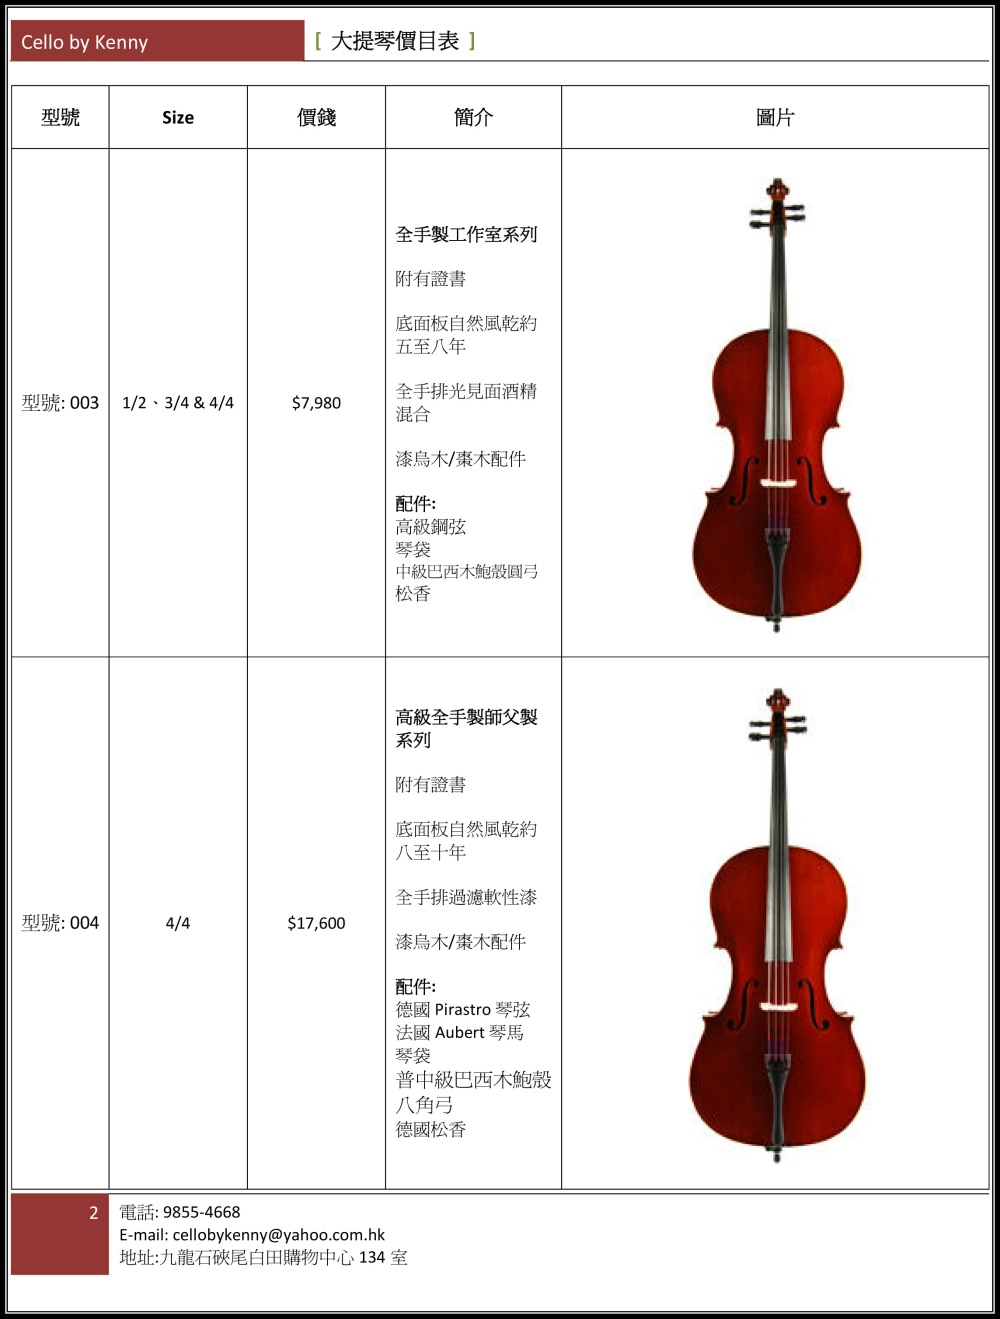 Cello price list-2